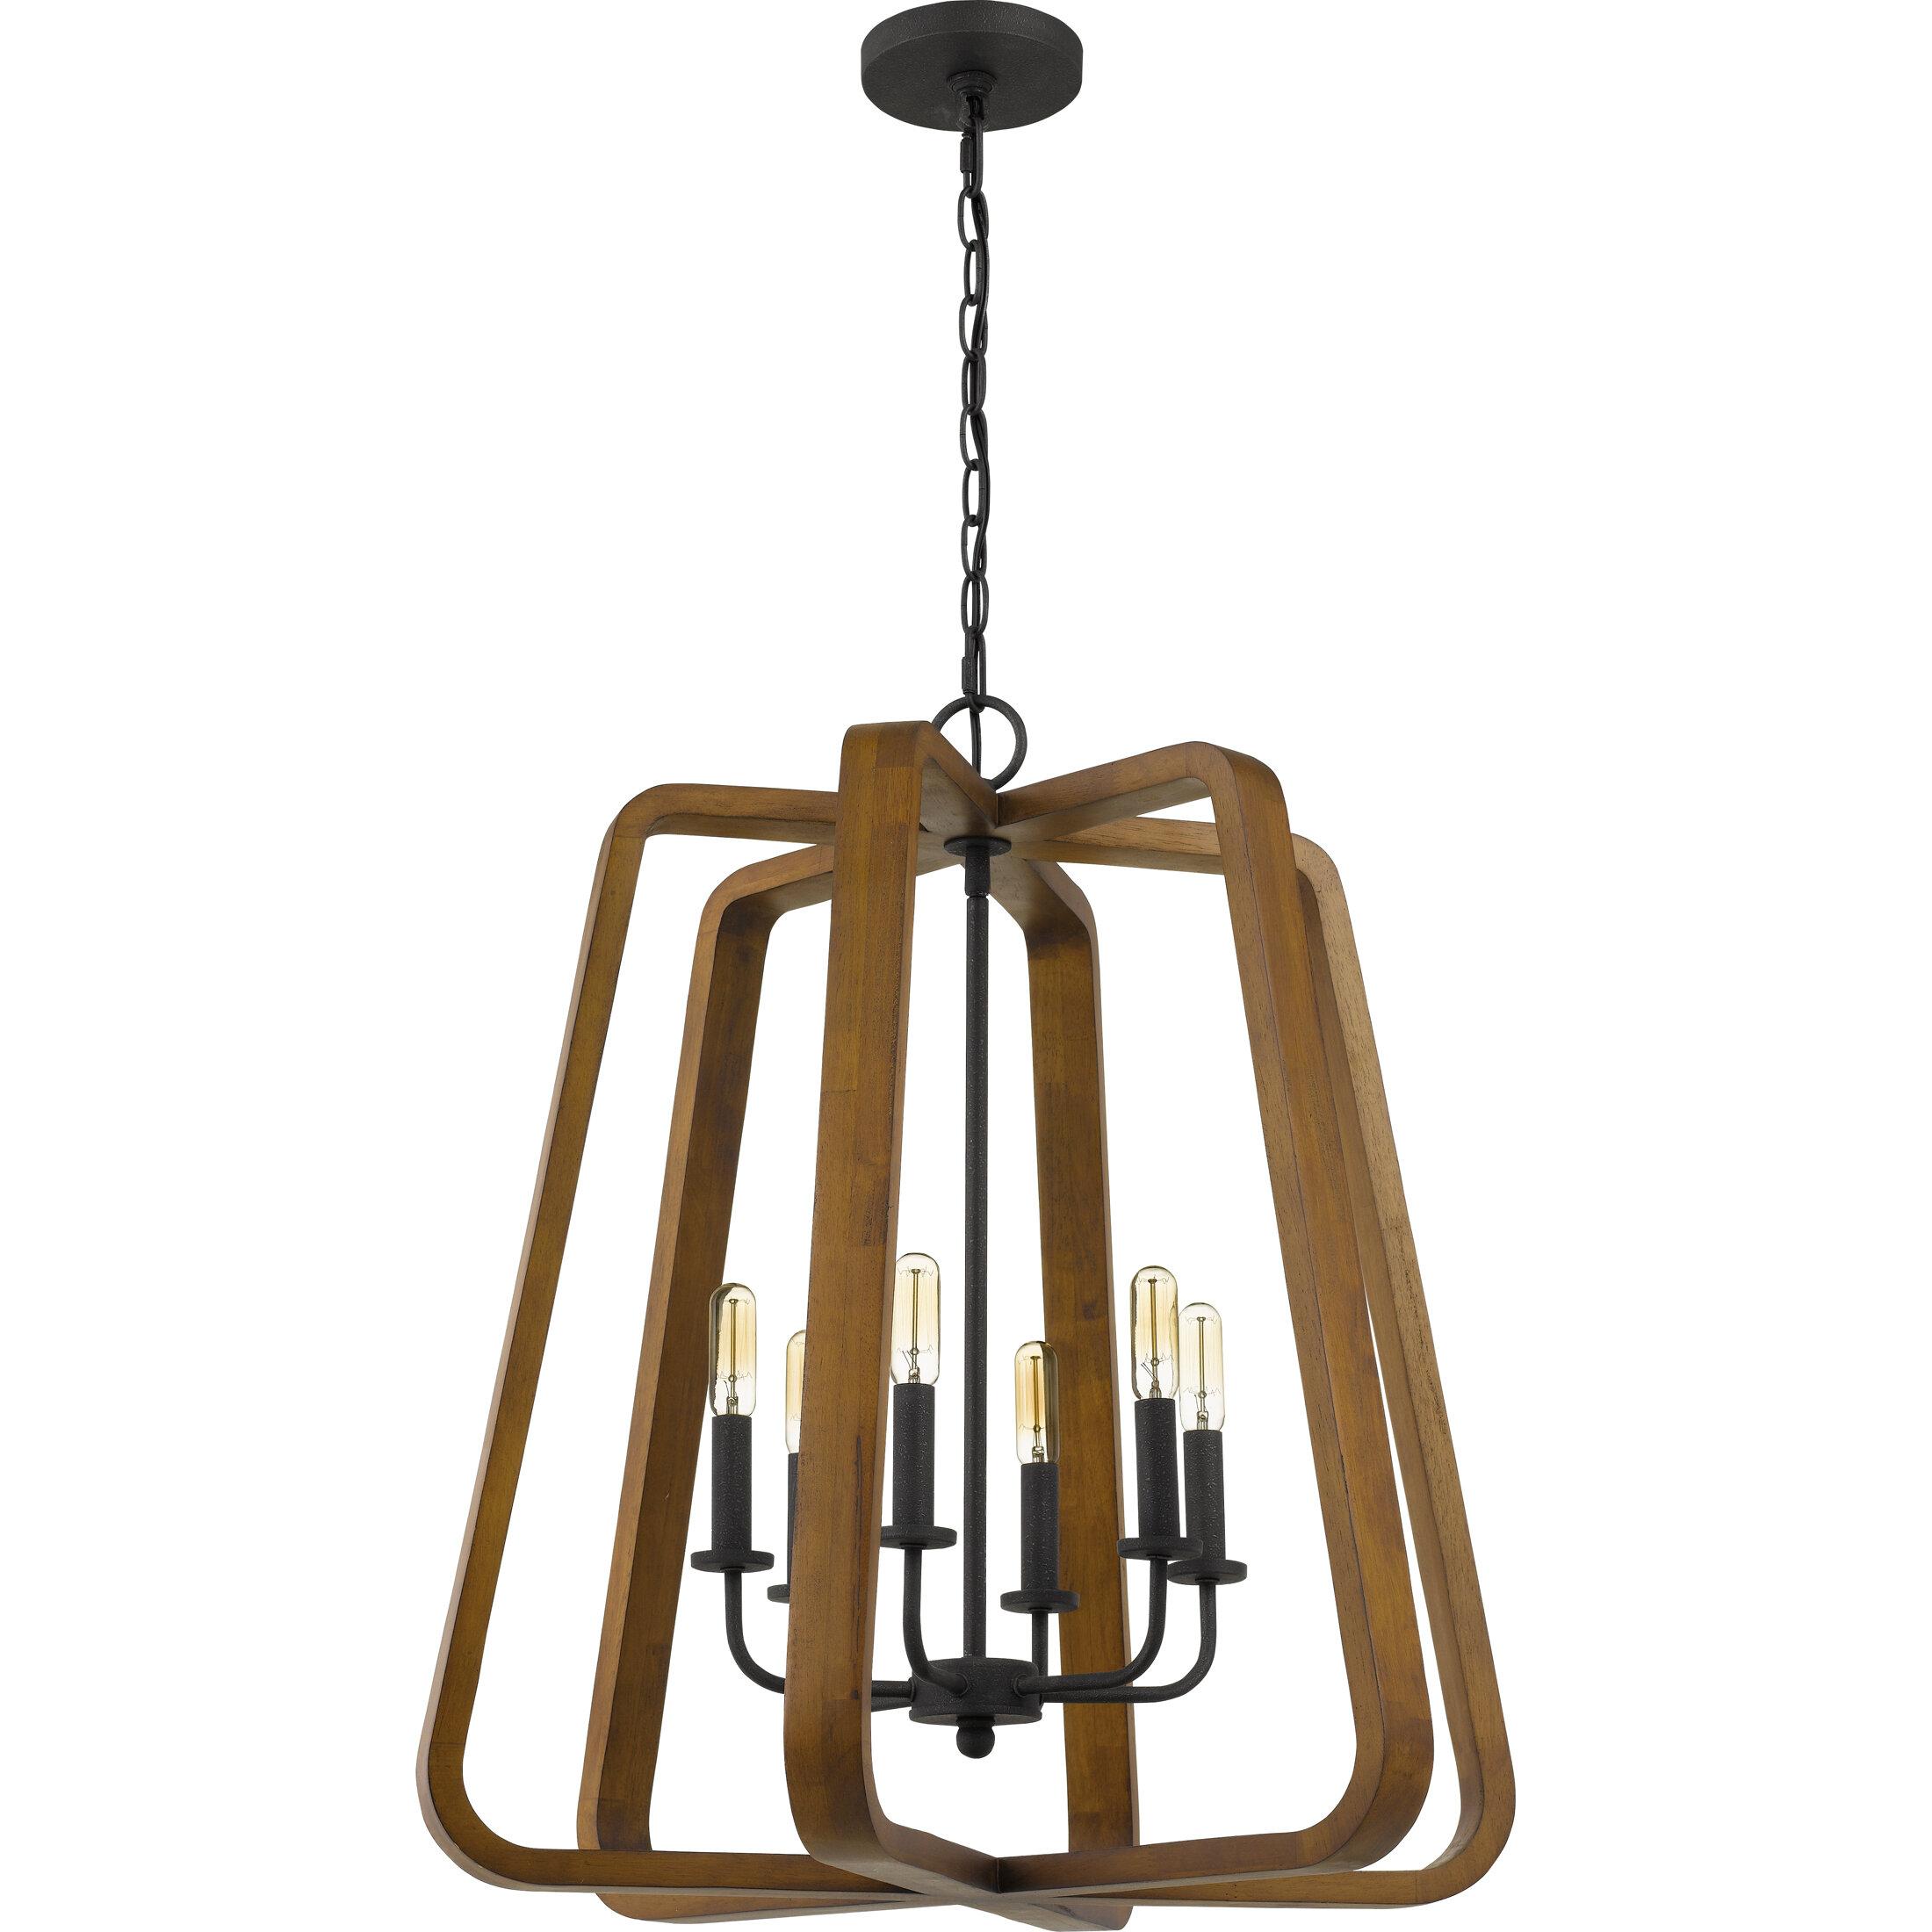 Gracie Oaks Raffaele 6 Light Candle Style Geometric Chandelier Wayfair